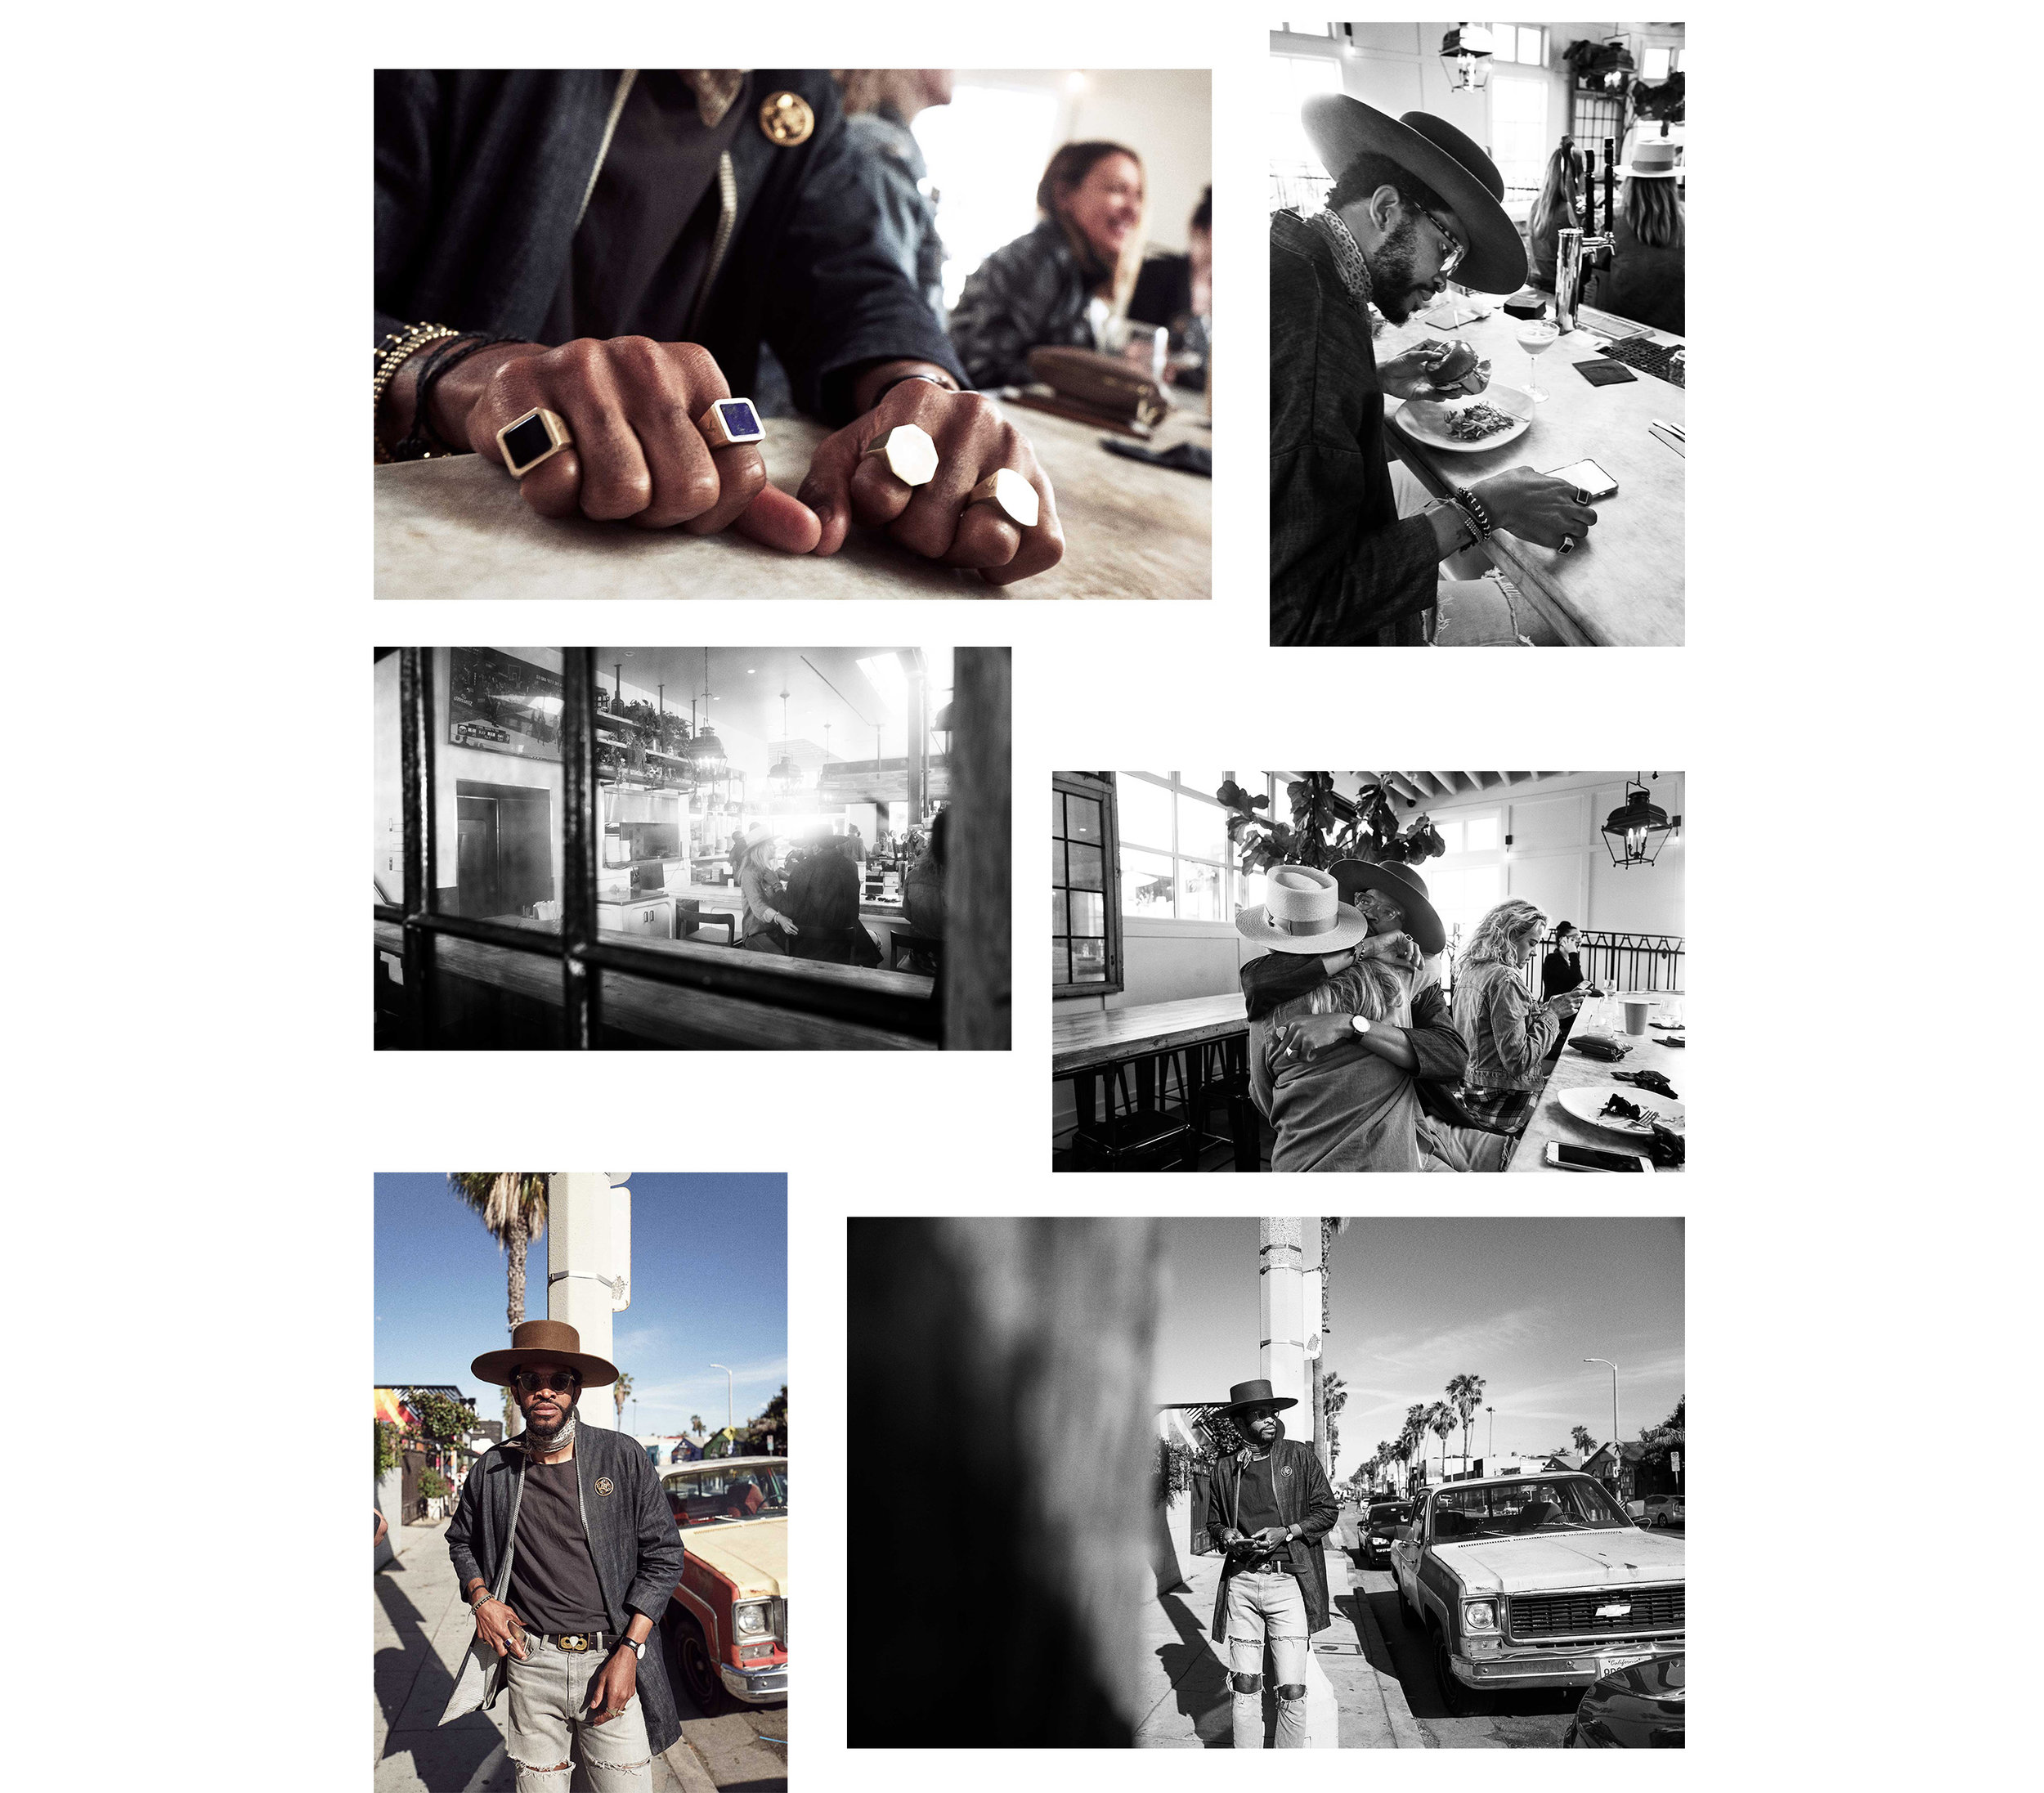 michael-scott-slosar-emmett-skyy-la-street-stories-4.jpg